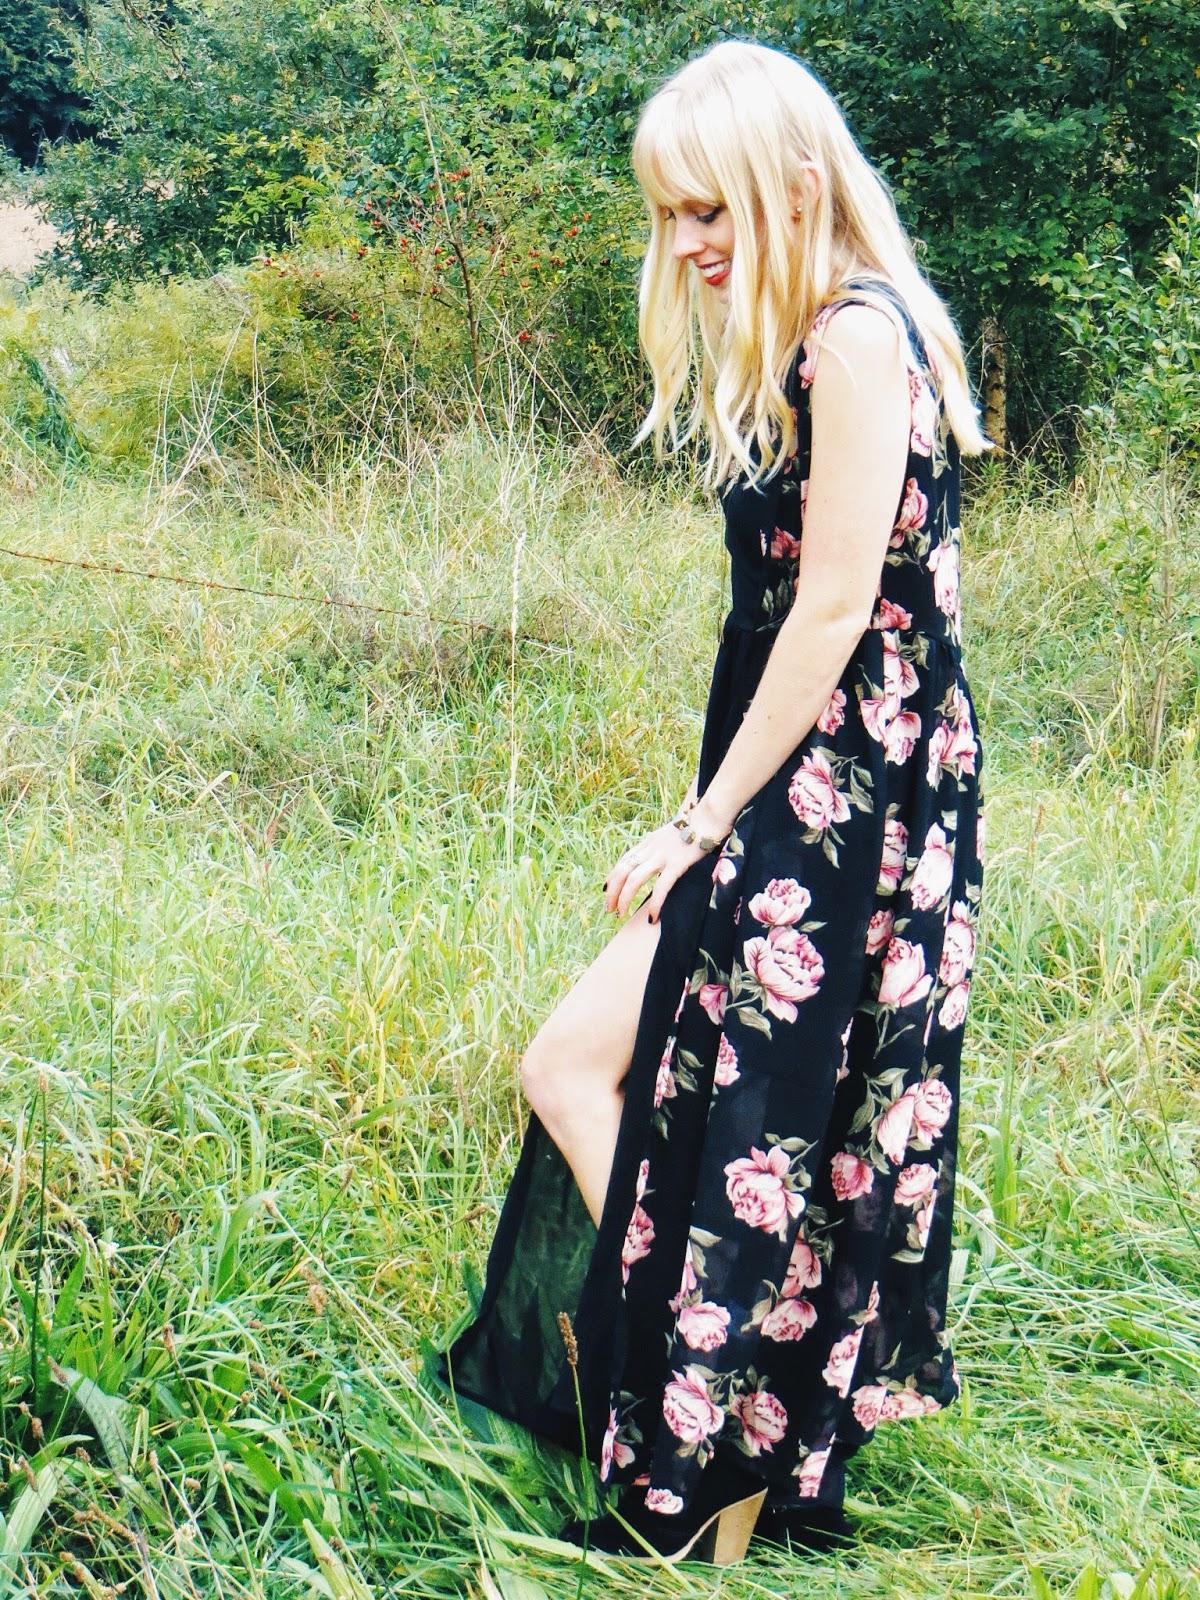 deb shops rose print duster, chicnova black maxi dress with slit, deb black ankle booties, niquegeek ravenclaw ring, 9th & elm guitar string ring, harry potter, boho, bohemian, hippie